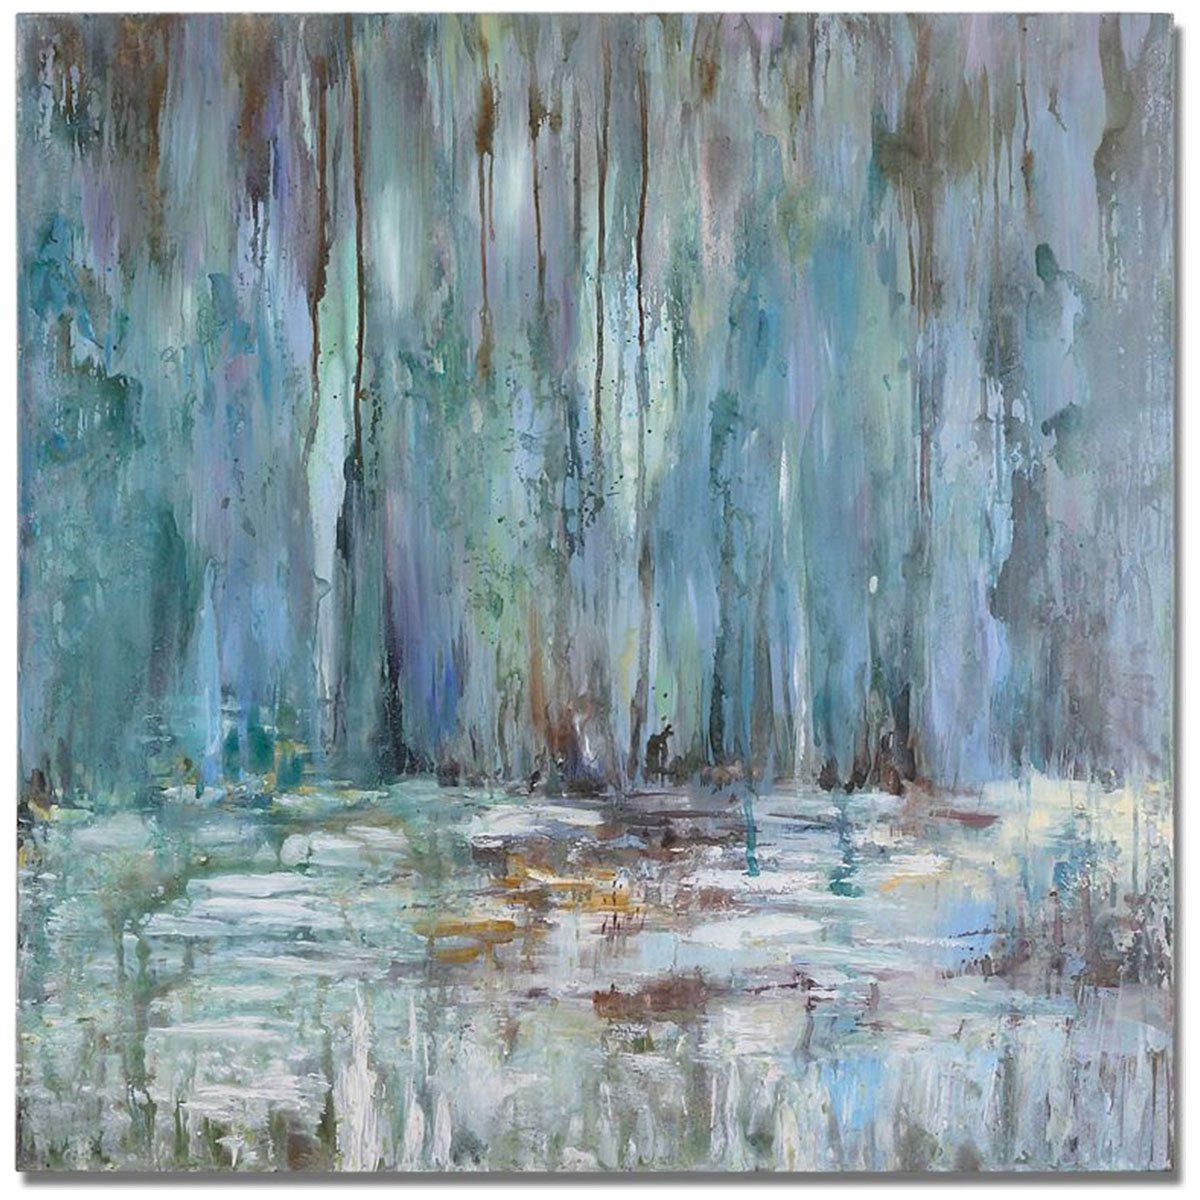 Uttermost 32240 Waterfall Art, Blue